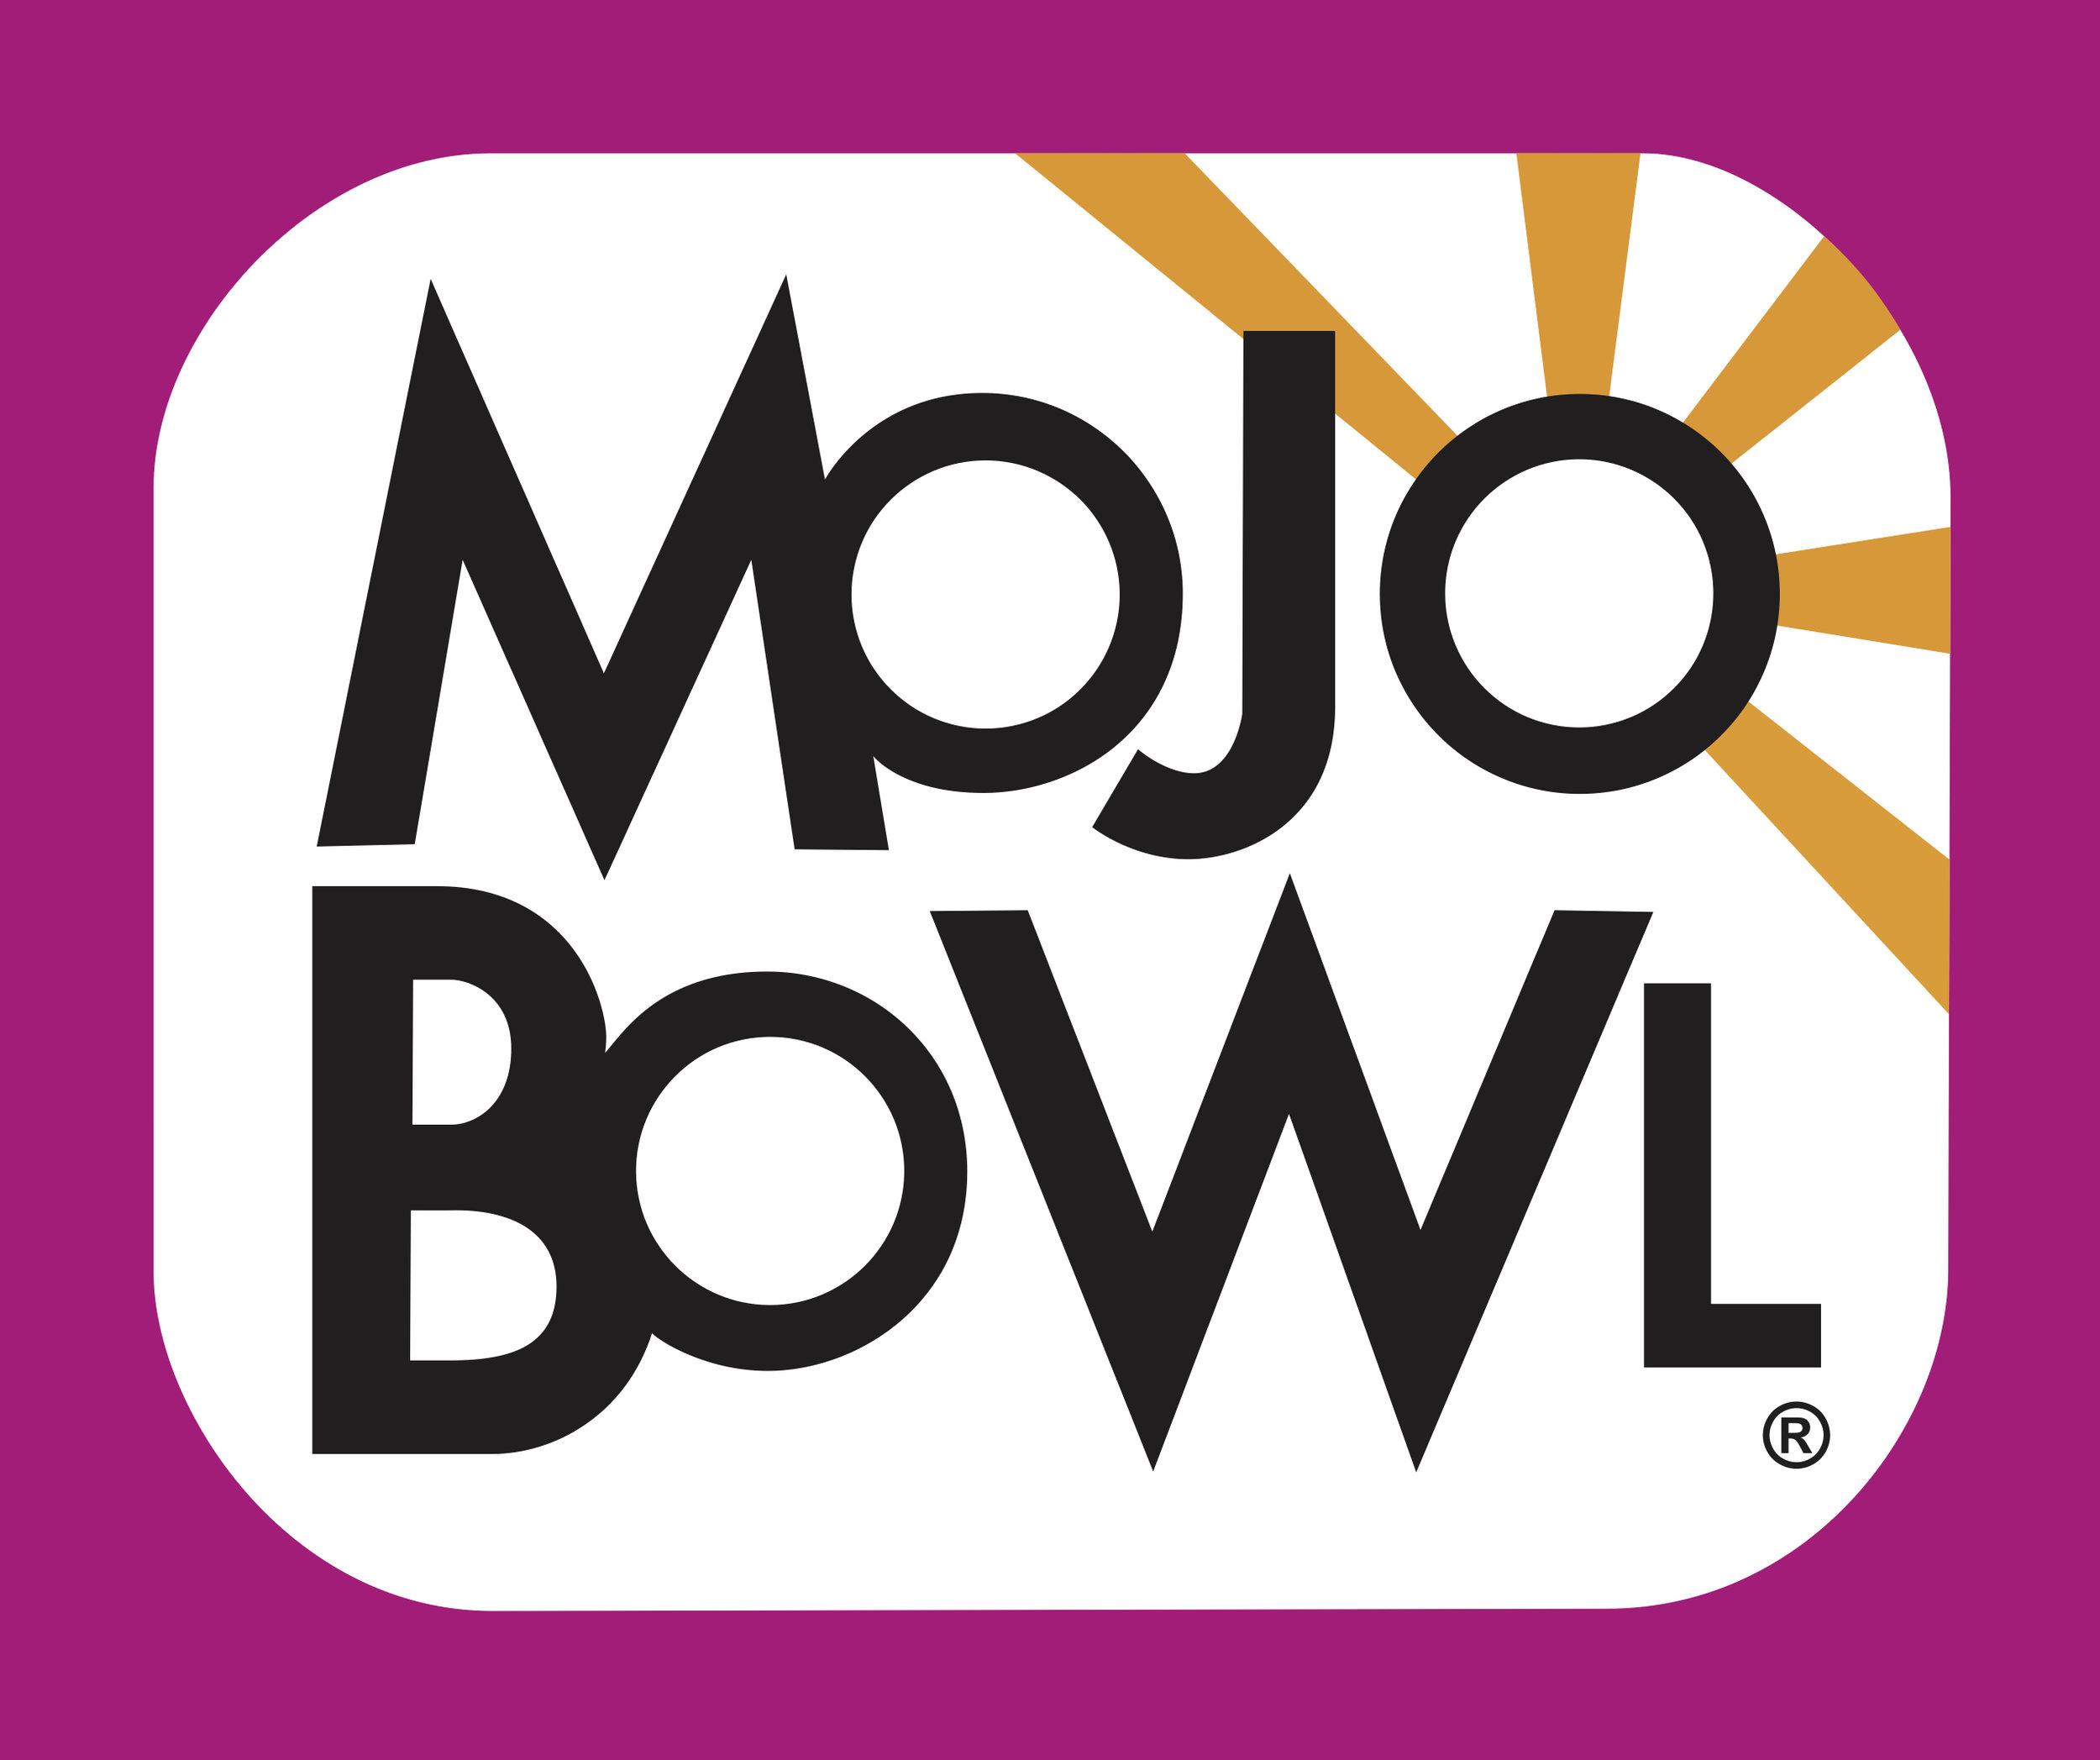 MB logo 11-11-18 JPEG.jpg